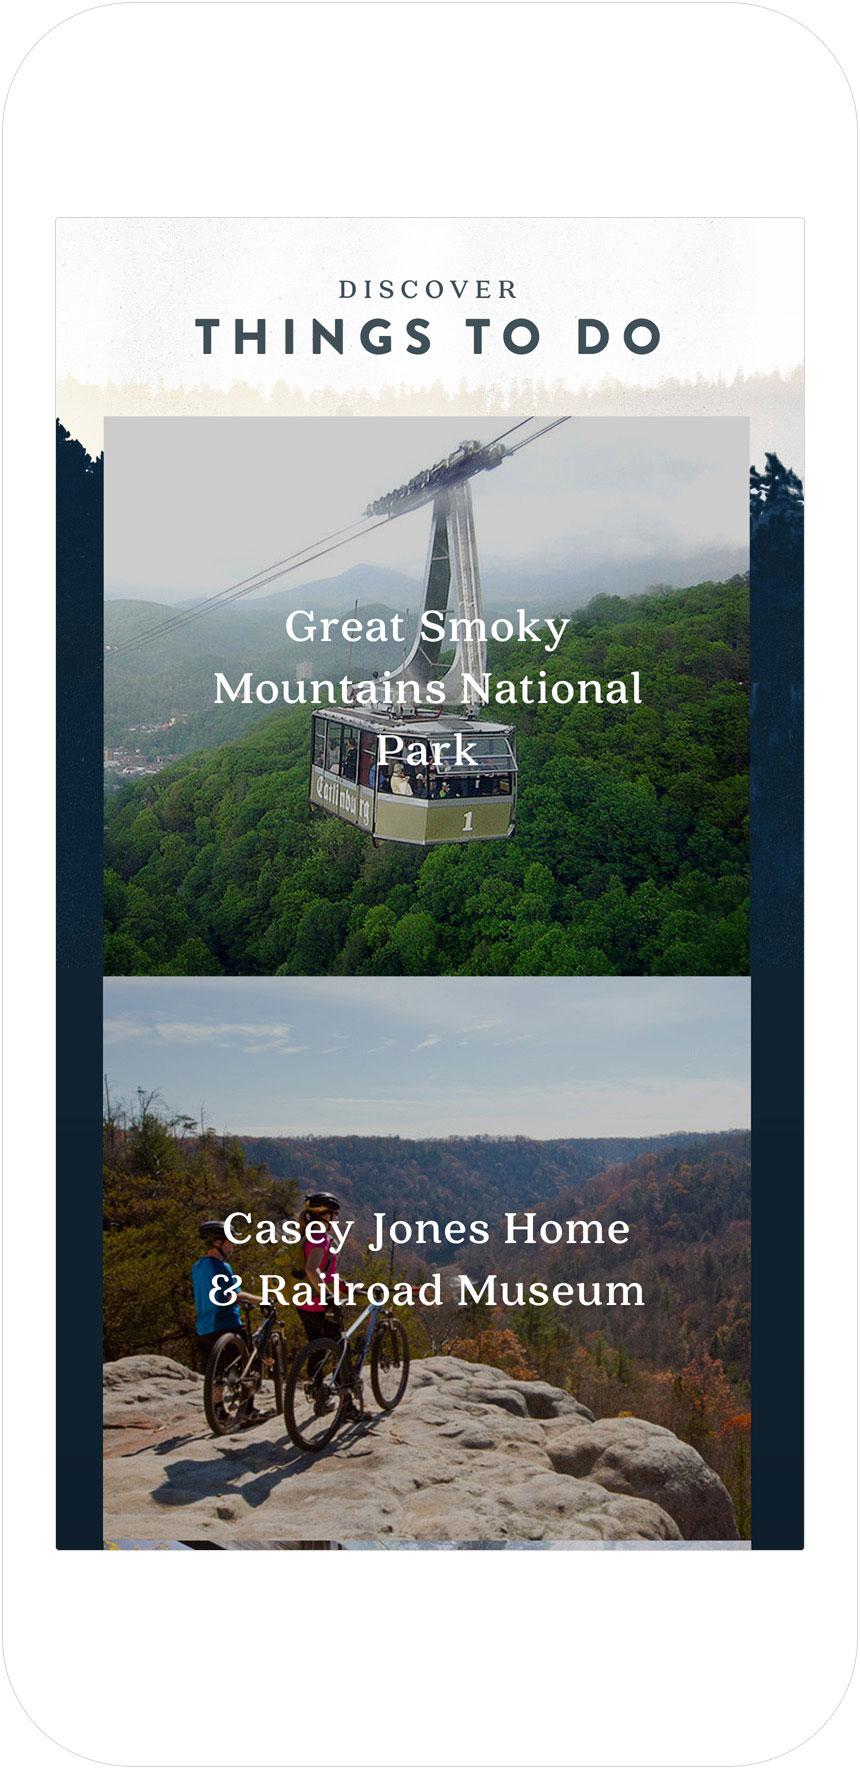 Web Design | Elk Springs Resort - Things To Do (Mobile View)